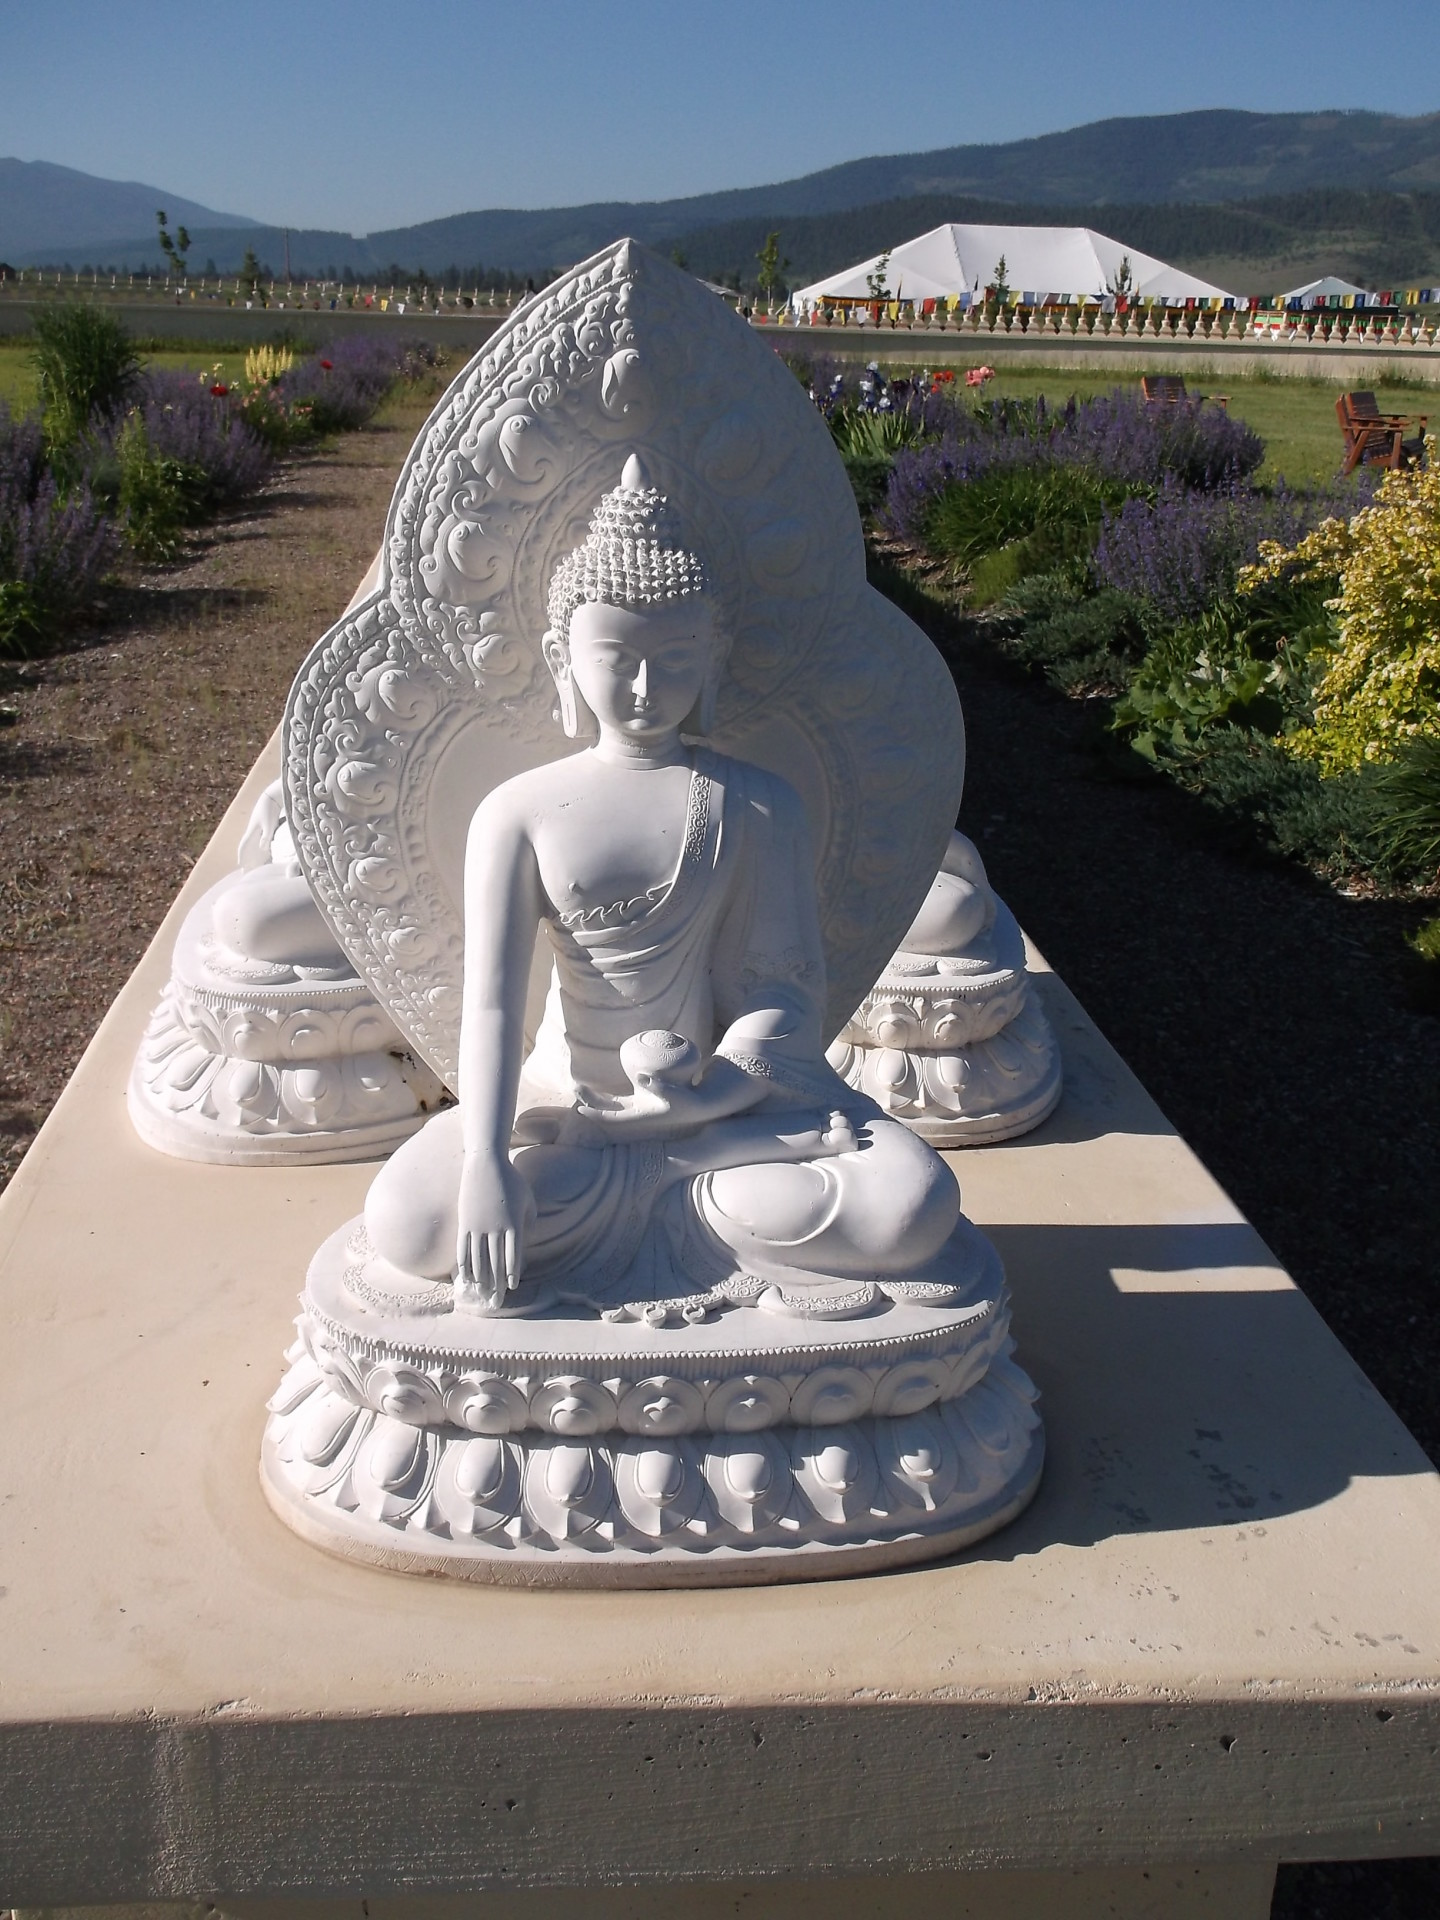 Montana, Buddha, Truth, Freedom, Love, Nature, Spirituality, Rebirth, Chakra, Mantra